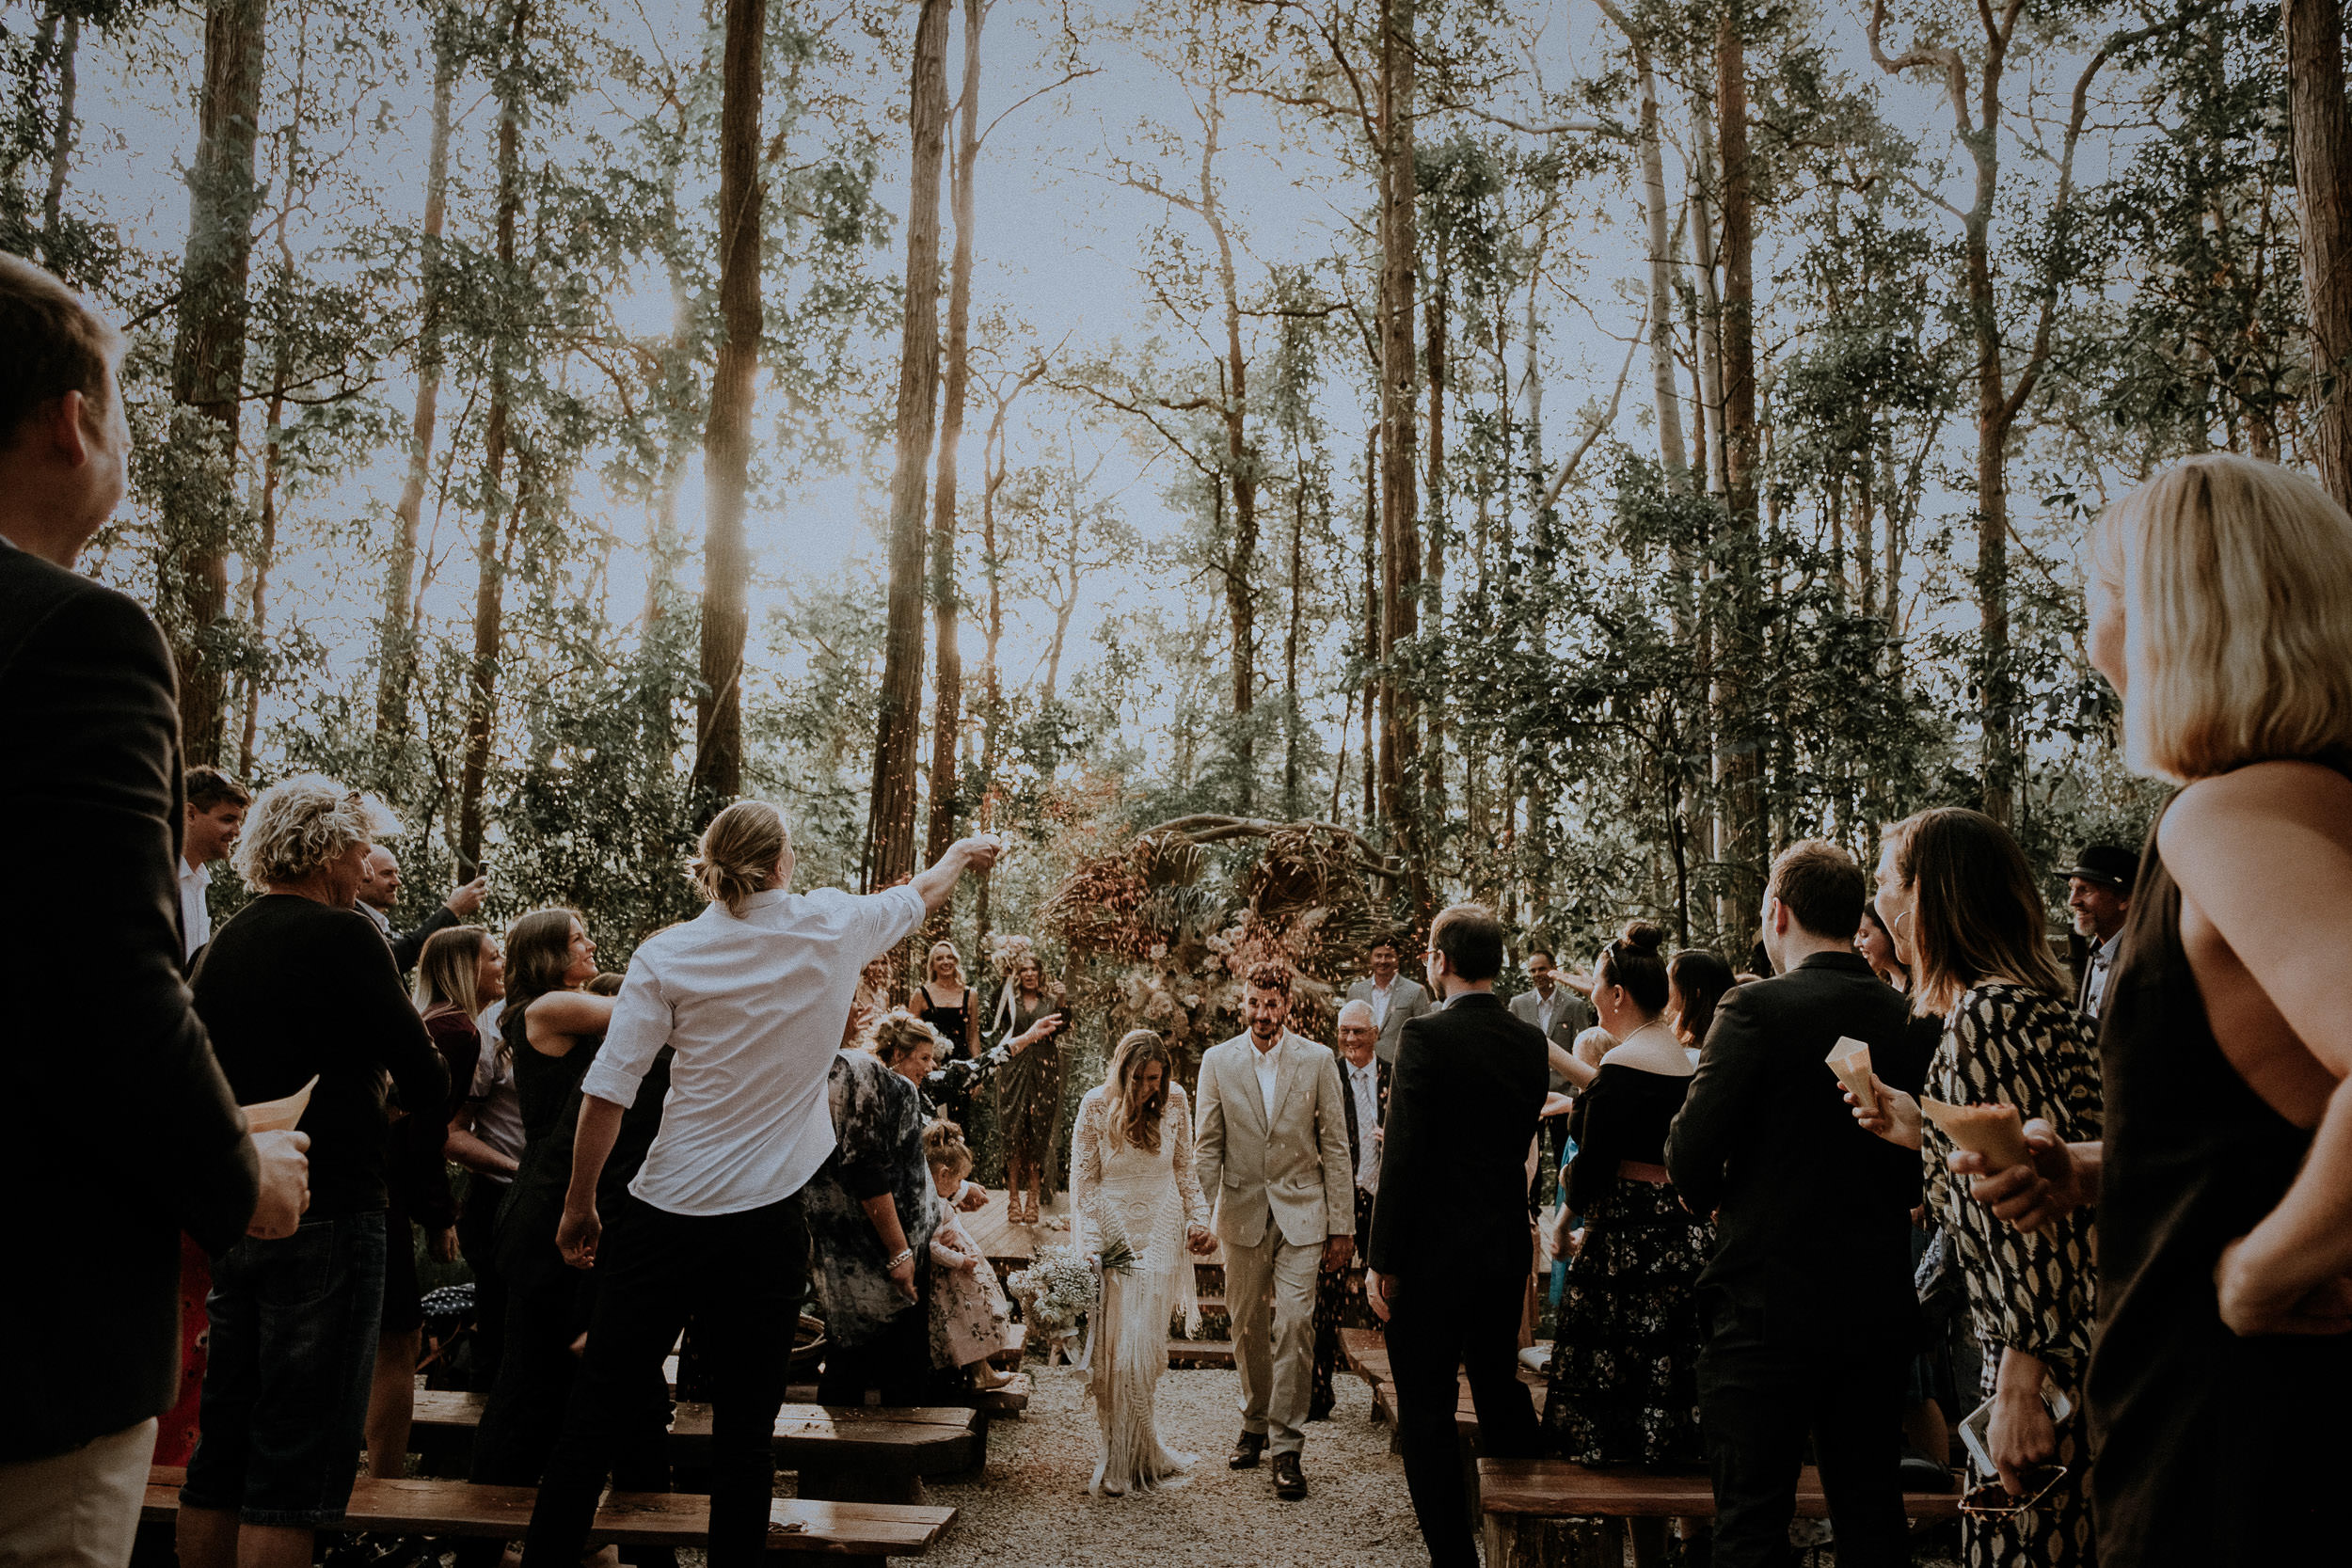 S&A Elopement - Kings & Thieves - Shred 'Til Dead - Central Coast Beach Forest Wedding - 282.jpg